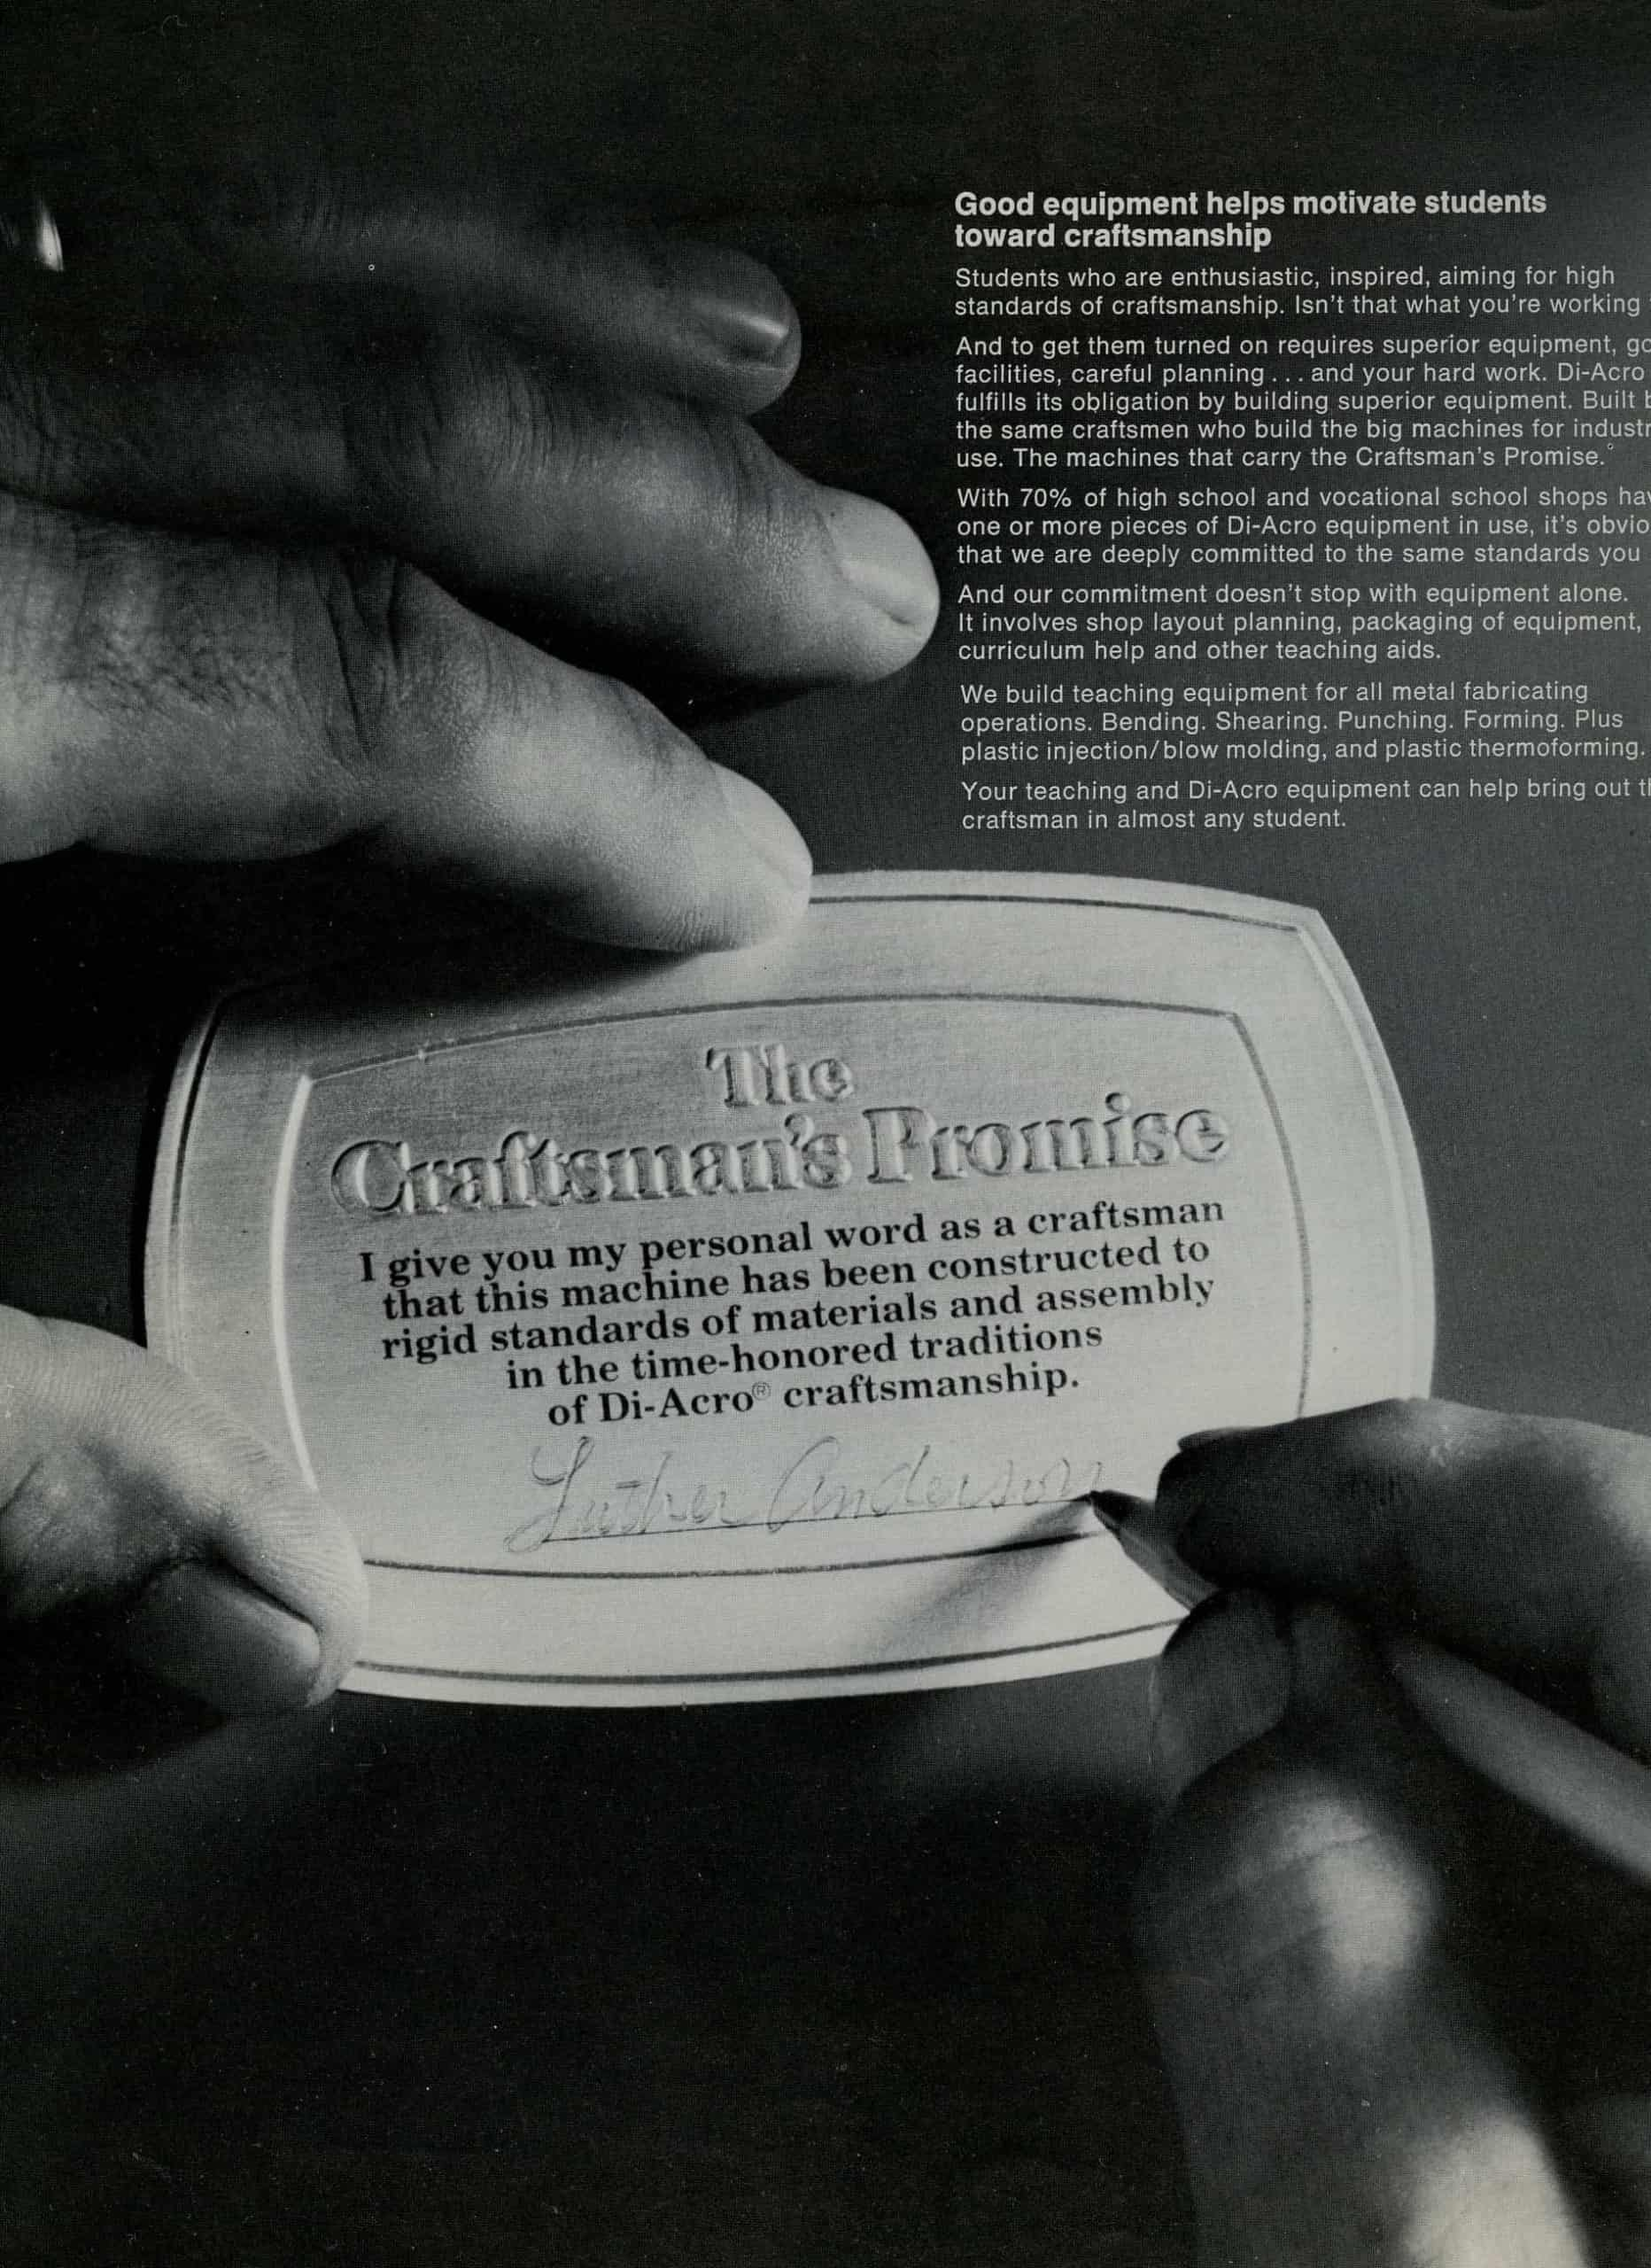 Craftsman's Promise